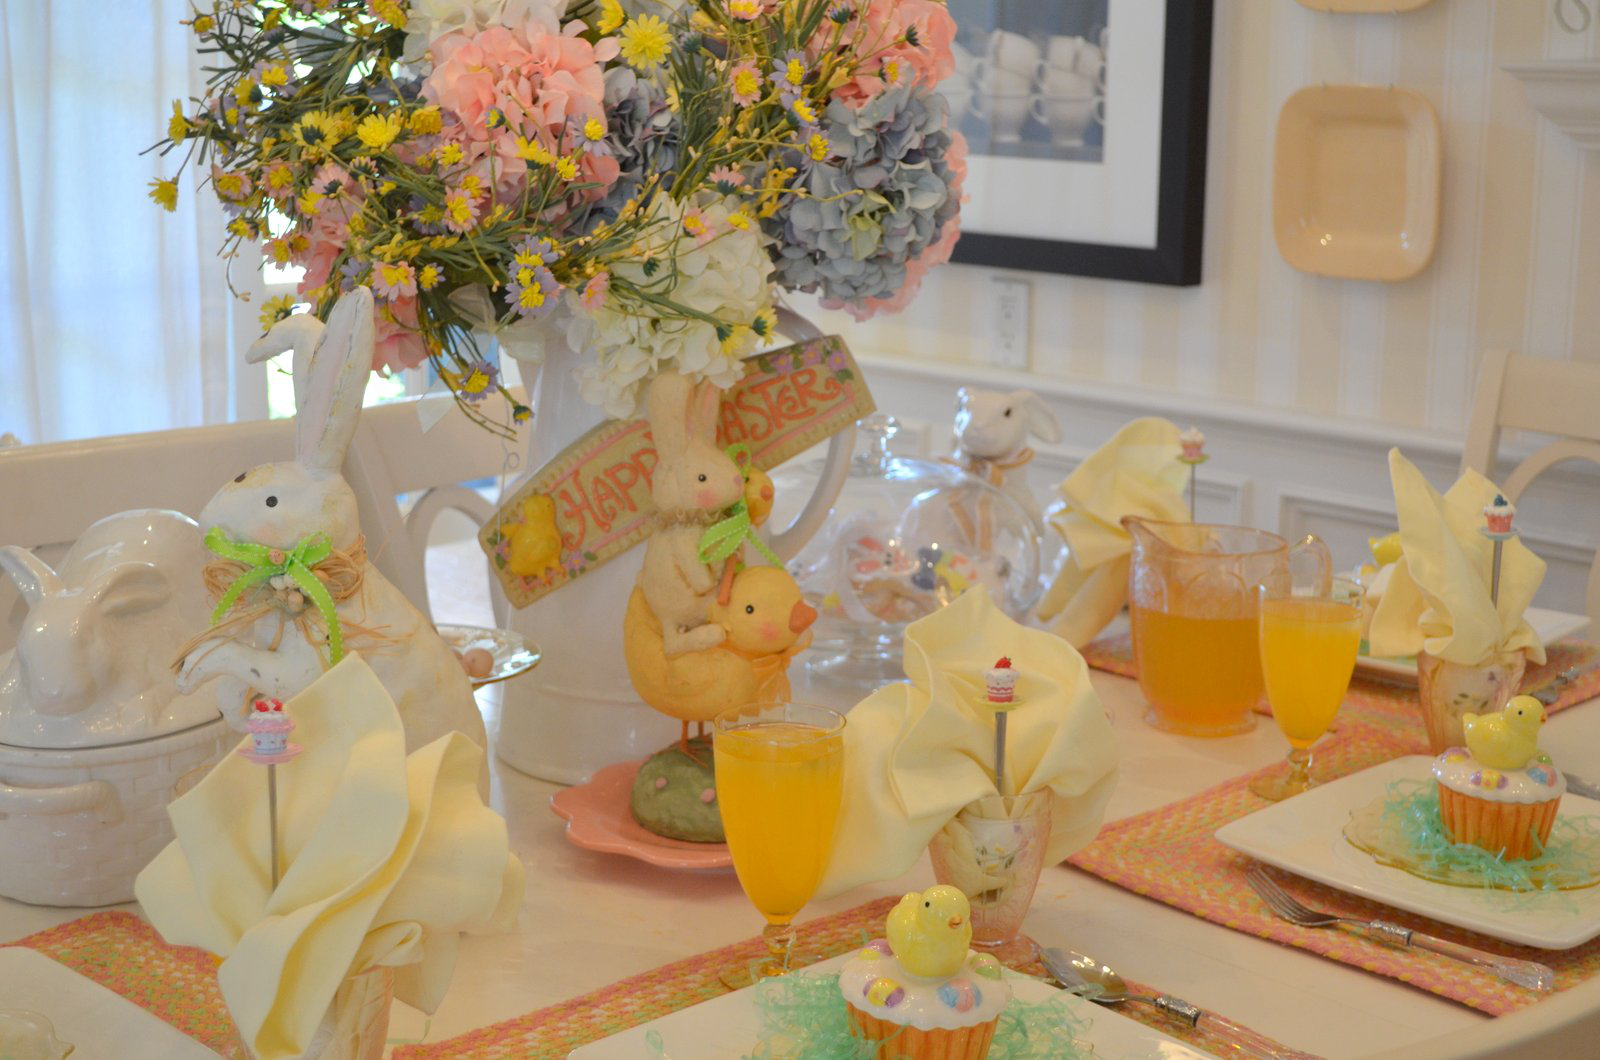 Tisch gestalten - Schmuck Ideen - Servietten Falten